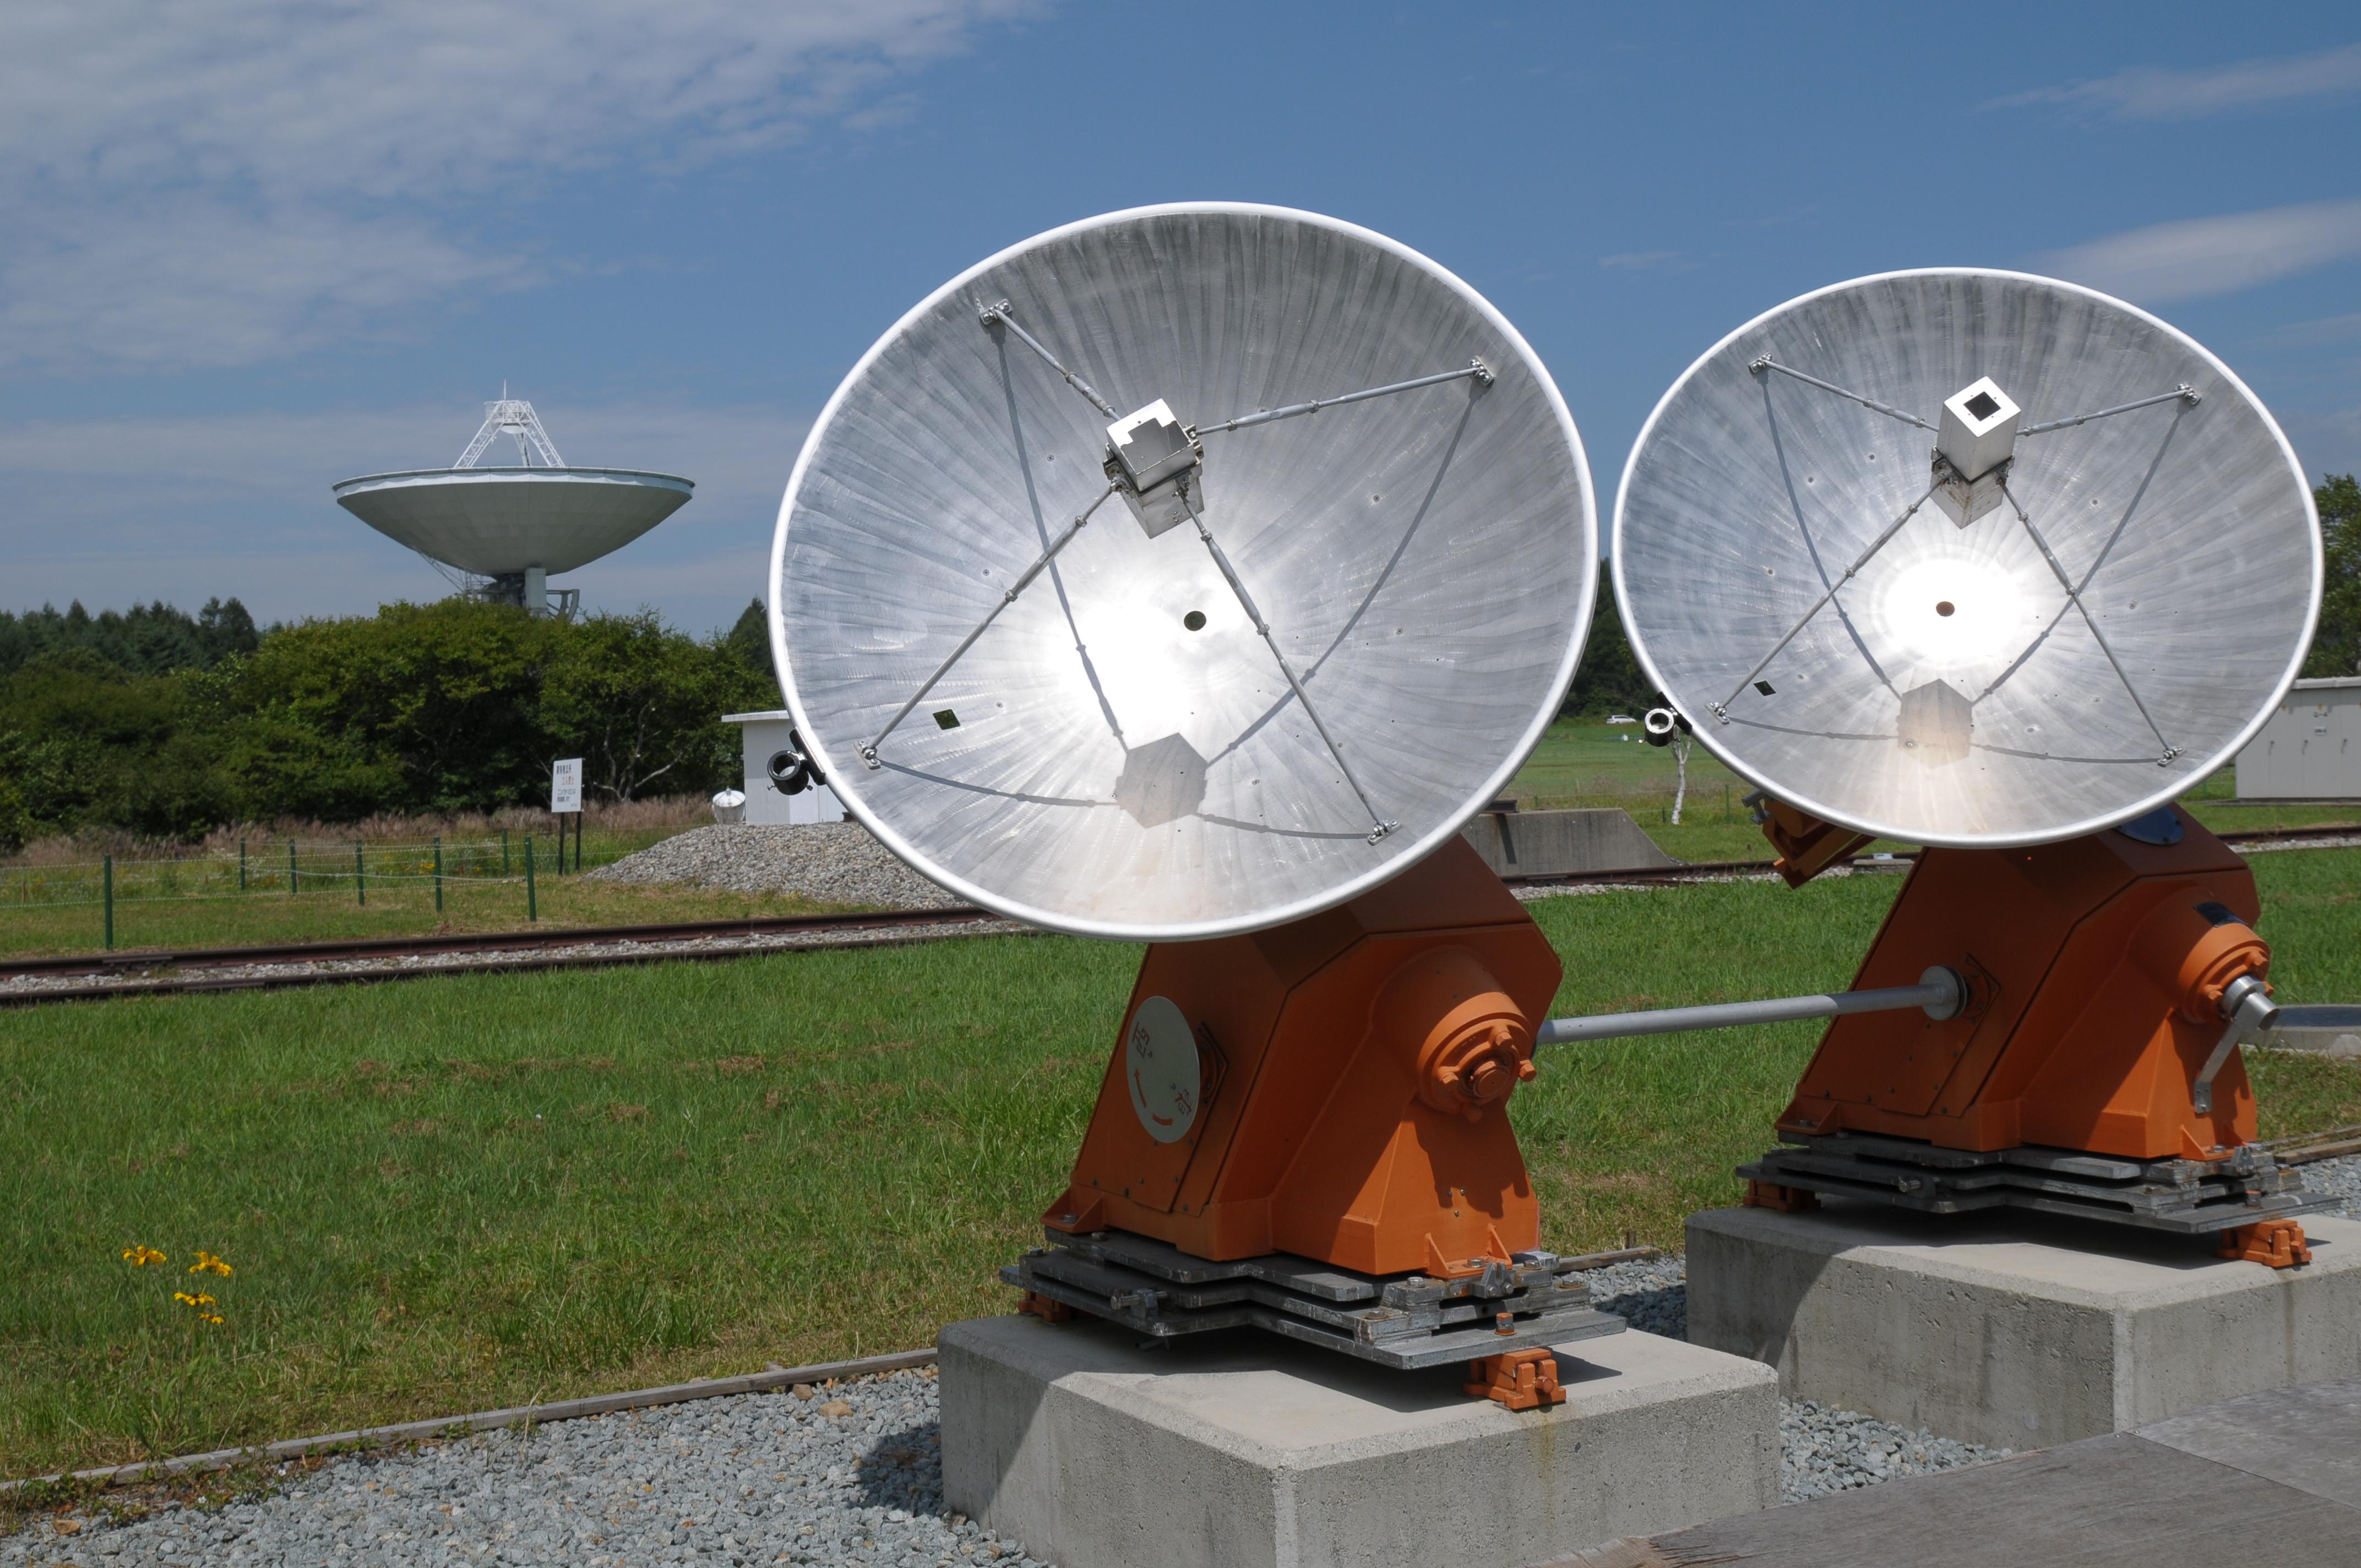 <b>D300 / SP AF 17-50mm F2.8 XR Di II VC / 約5MB / 4,288×2,848 / 1/640秒 / F11 / -0.3EV / ISO200 / WB:晴天 / 26mm</b>